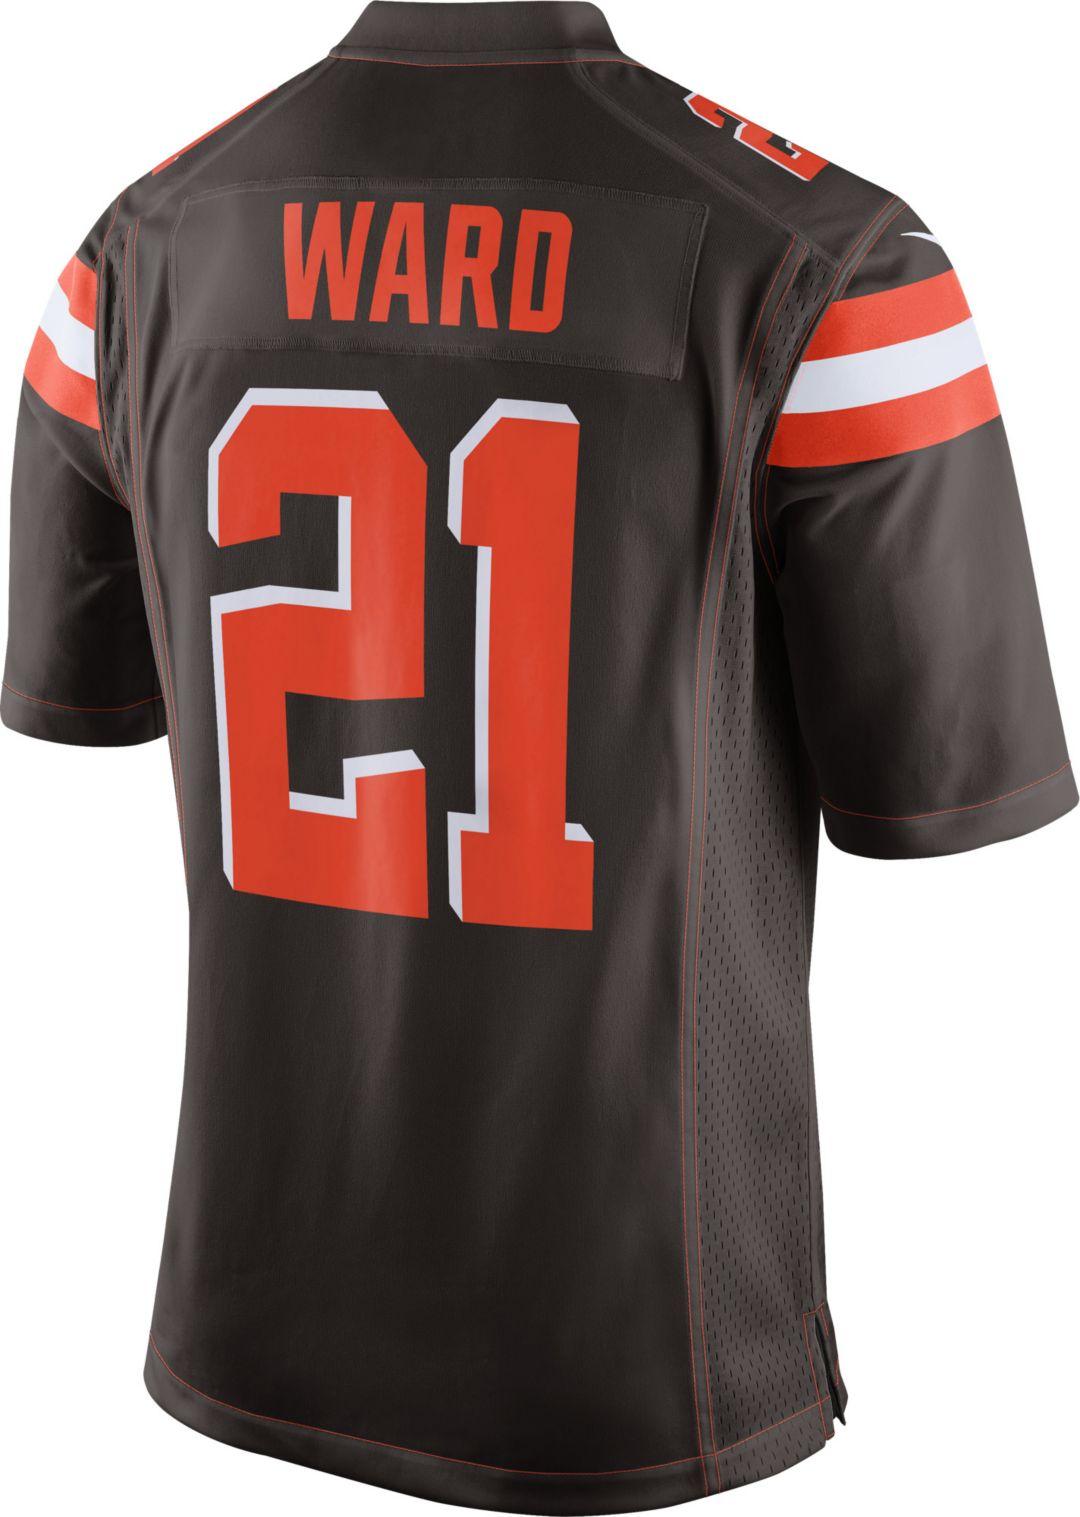 a1354317 Denzel Ward Nike Men's Cleveland Browns Home Game Jersey